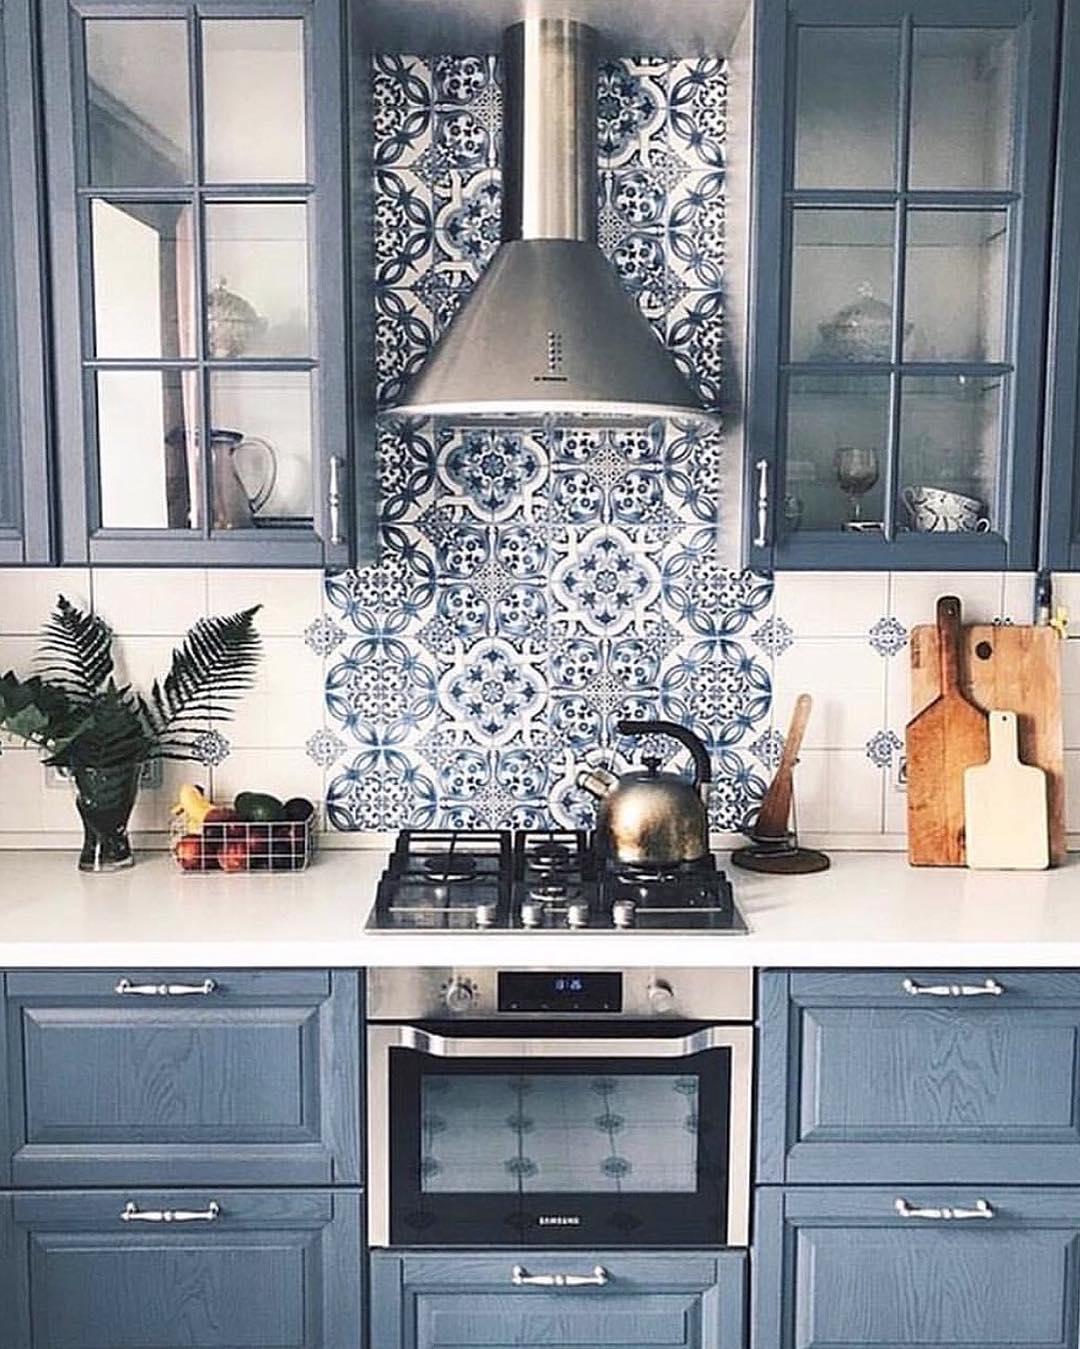 cucina-pareti-color-blu-navy-9